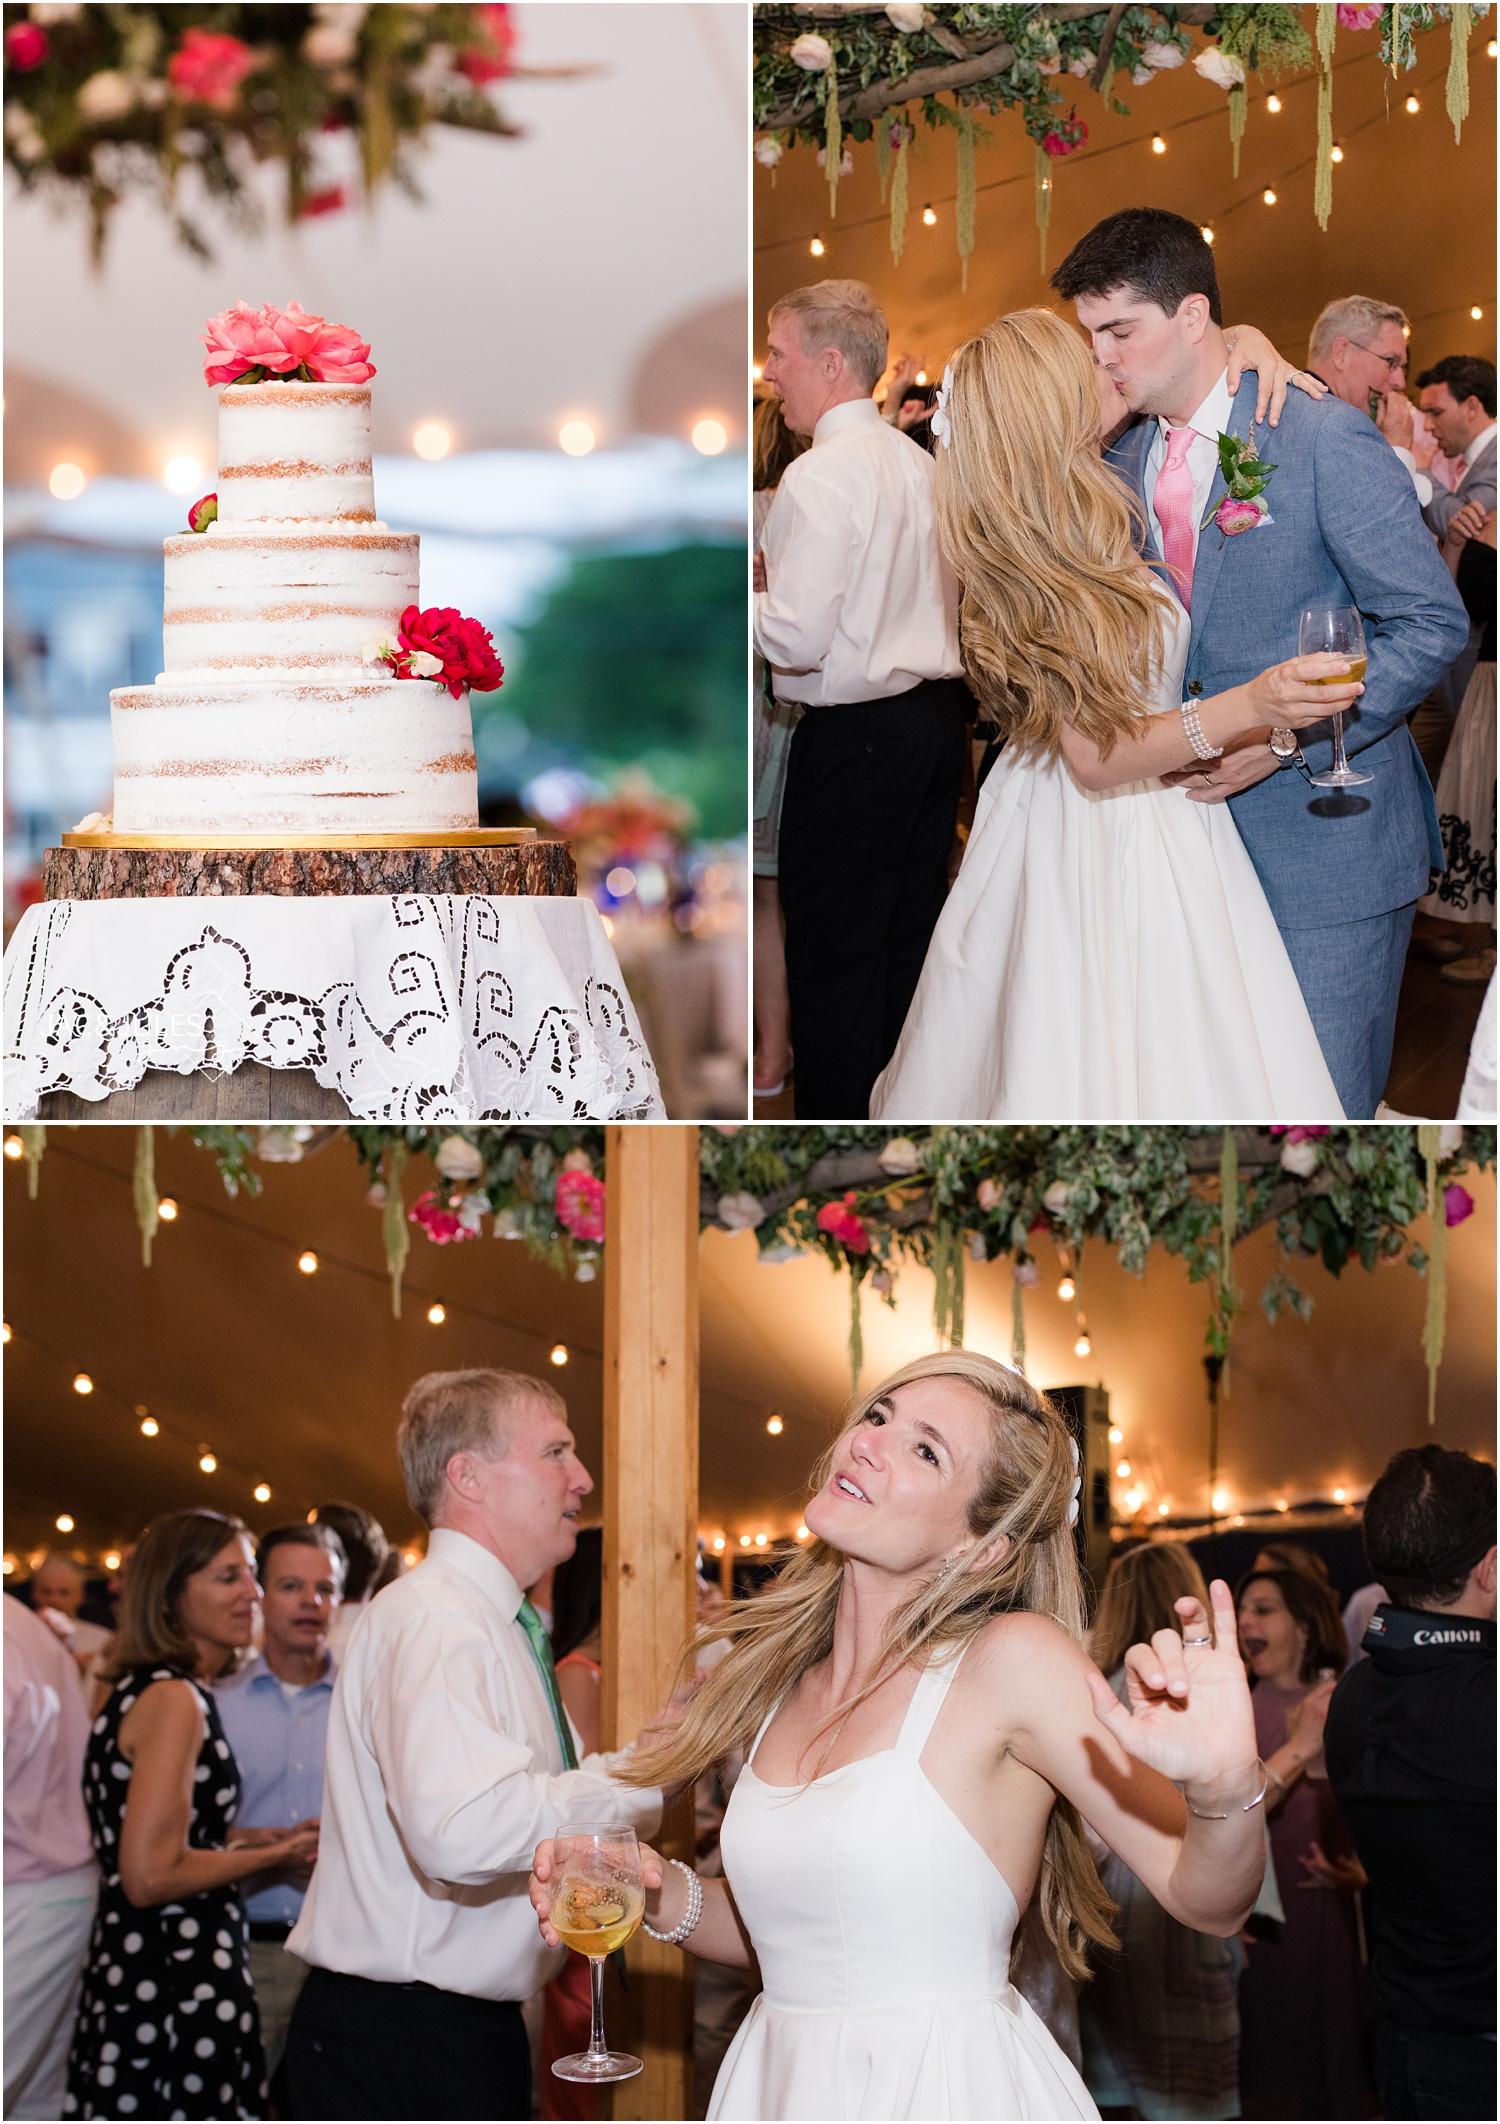 Beautiful naked wedding cake at Mantoloking Yacht Club.